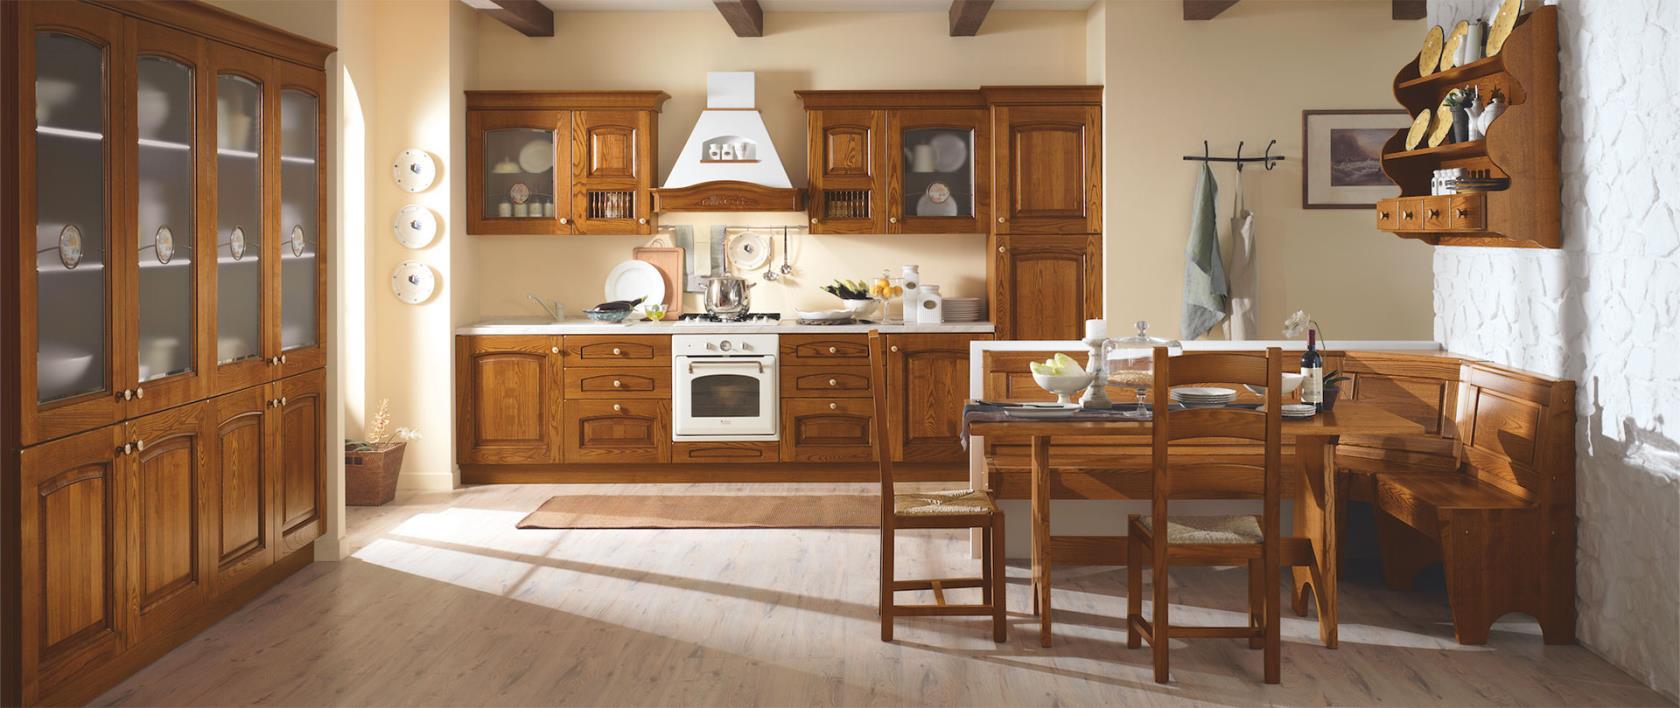 Cucine Classiche a Crotone